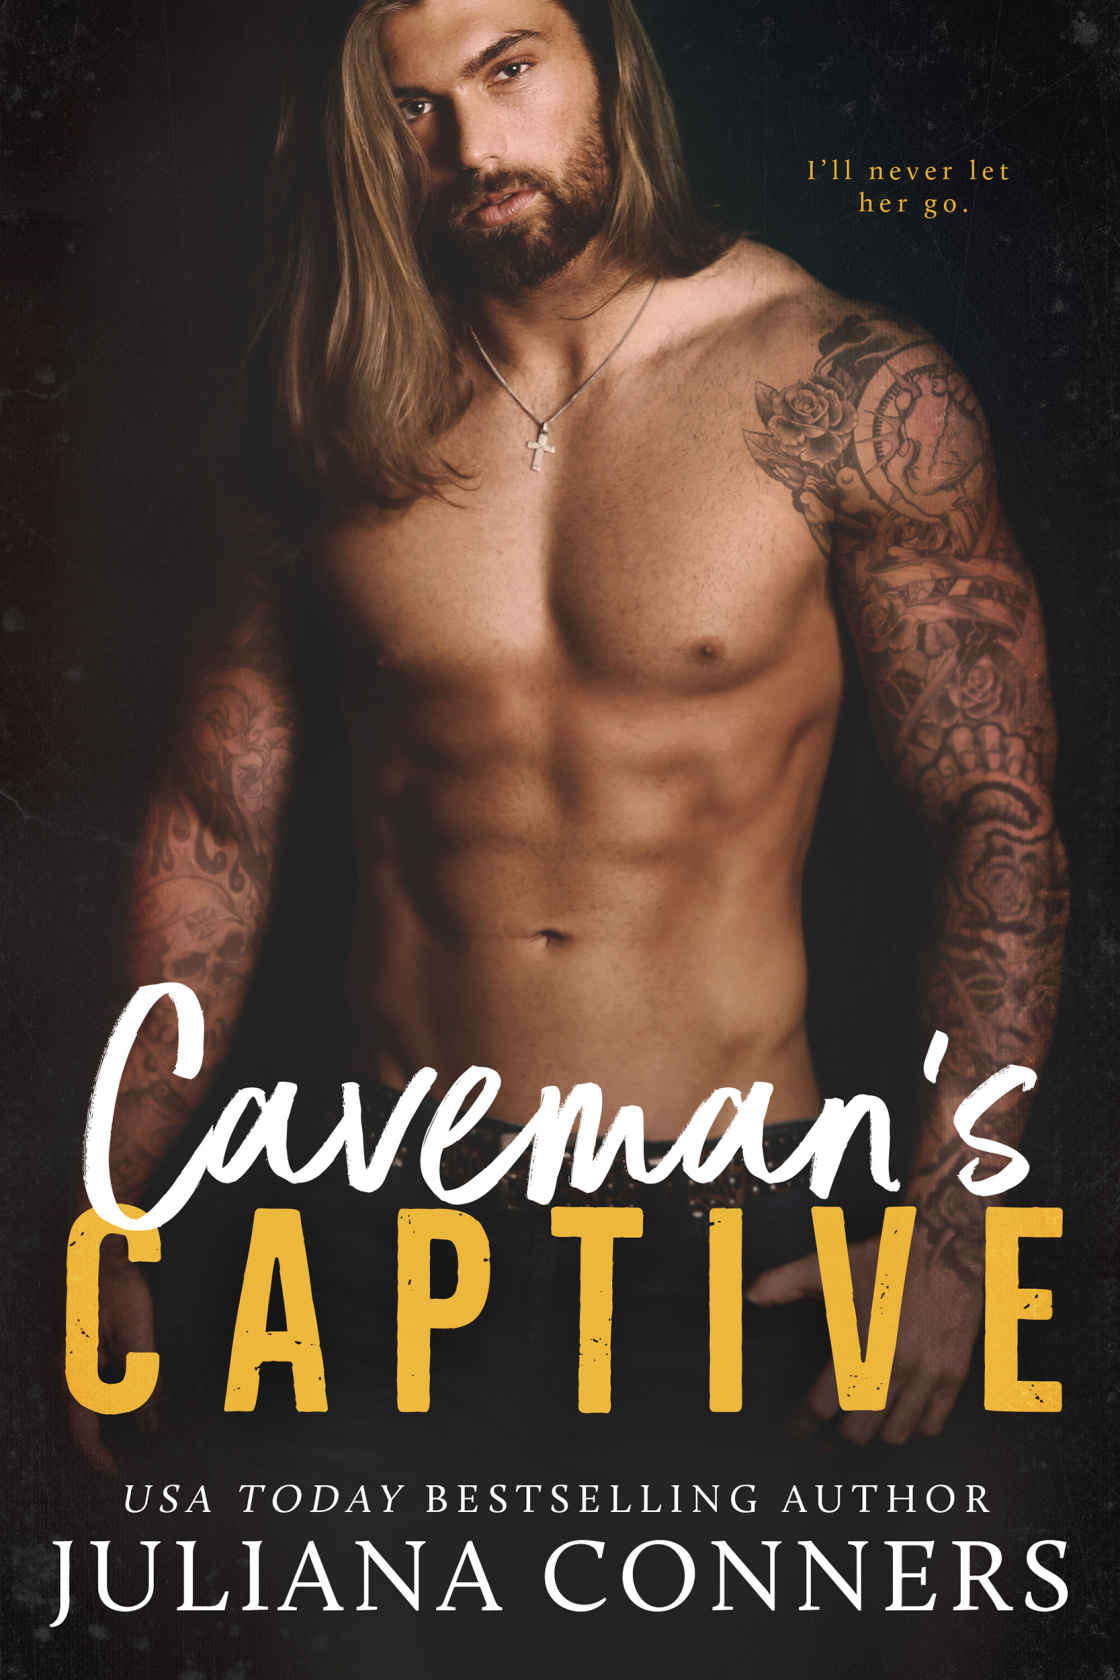 CAVEMAN'S CAPTIVE